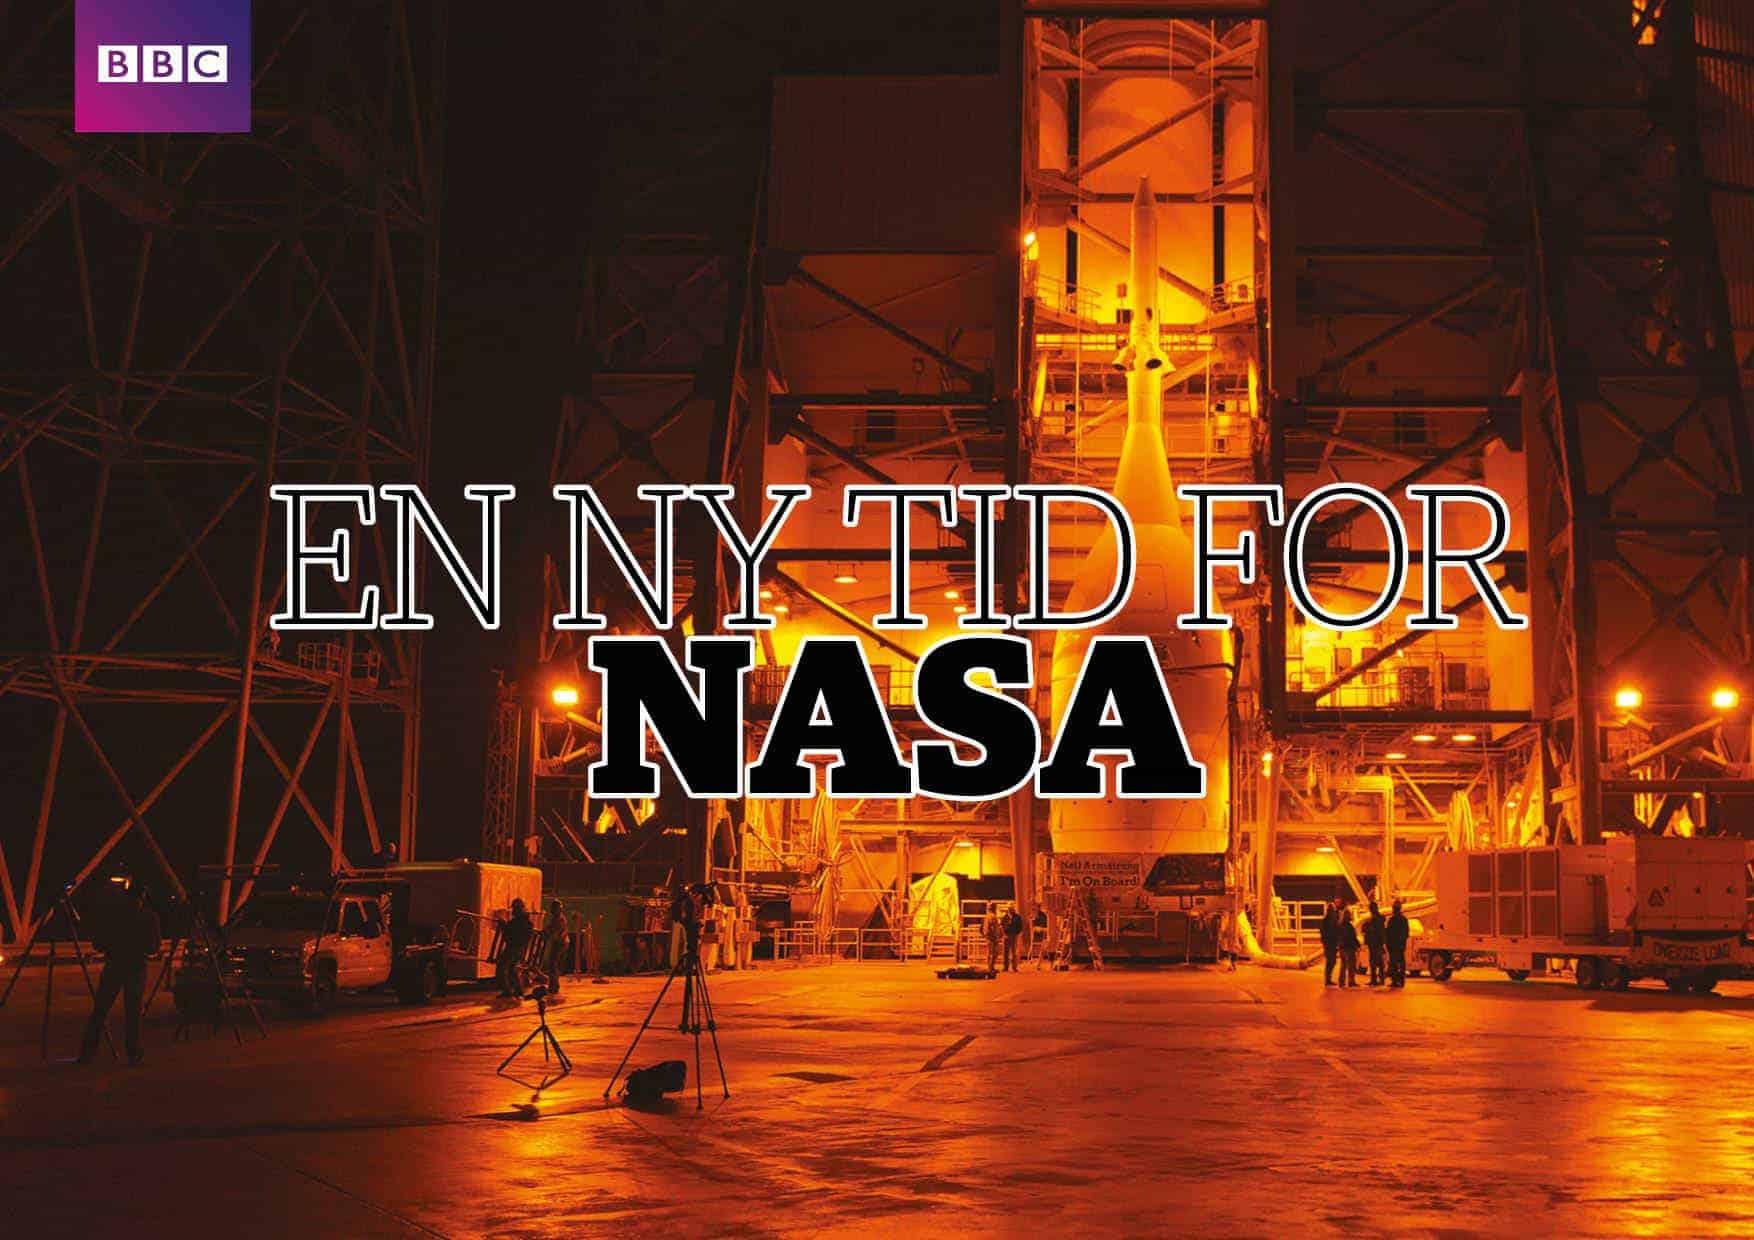 En ny tid for NASA